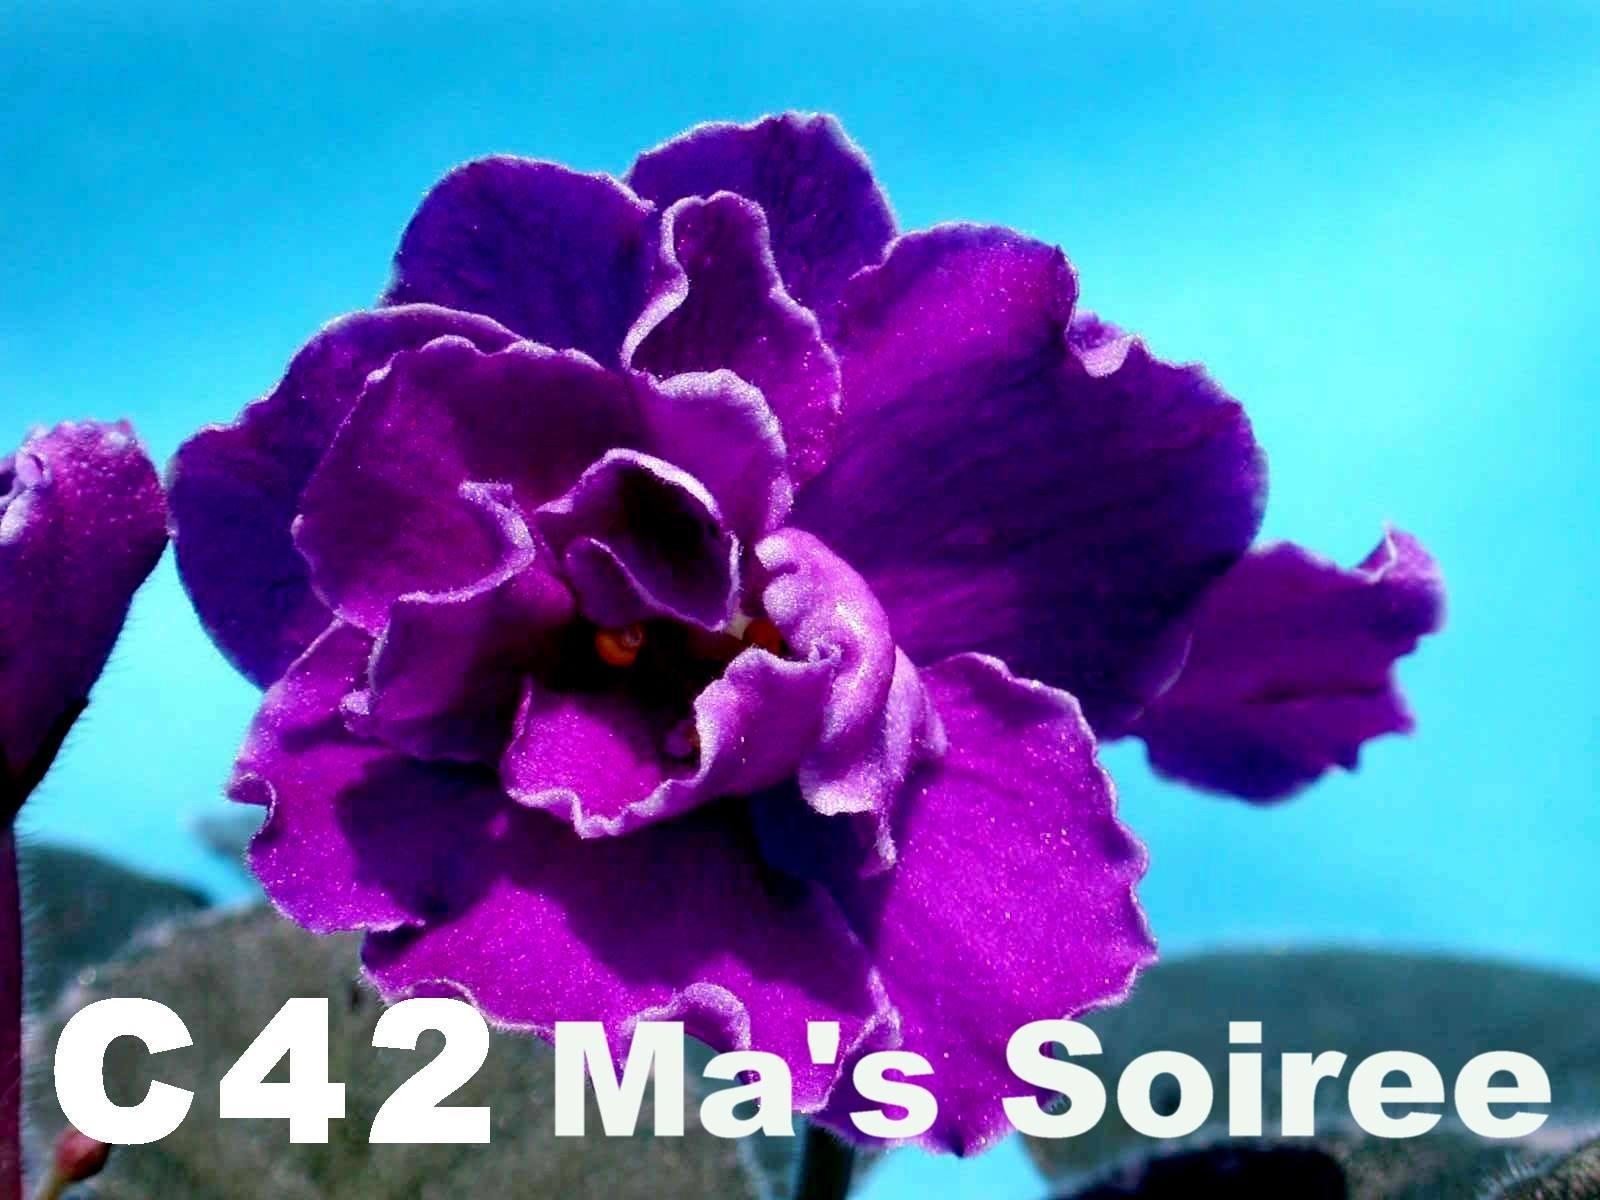 [C42] Ma's Soiree C42